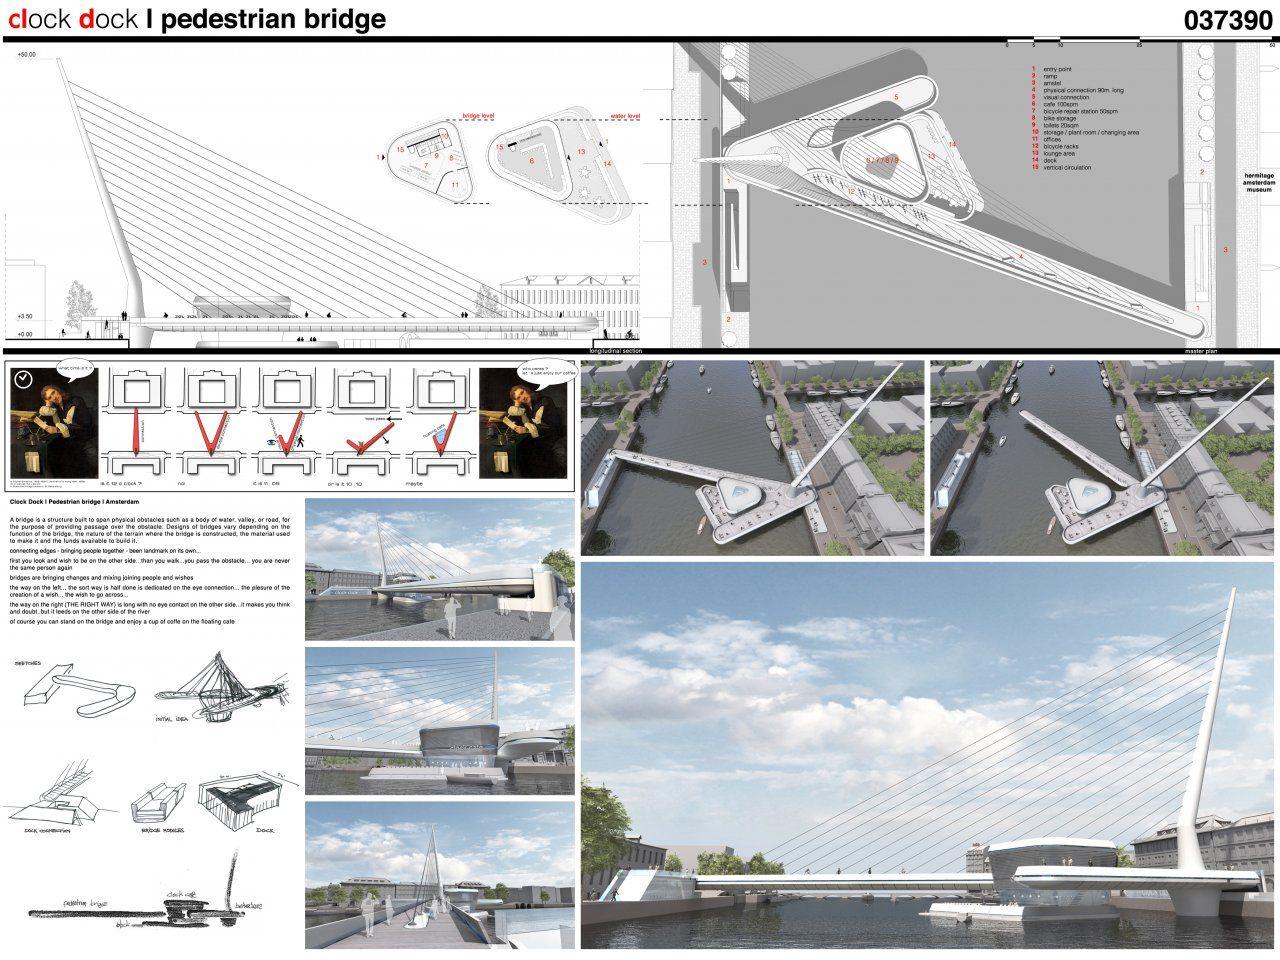 A3n amsterdam iconic pedestrian bridge competition for Design bridge amsterdam